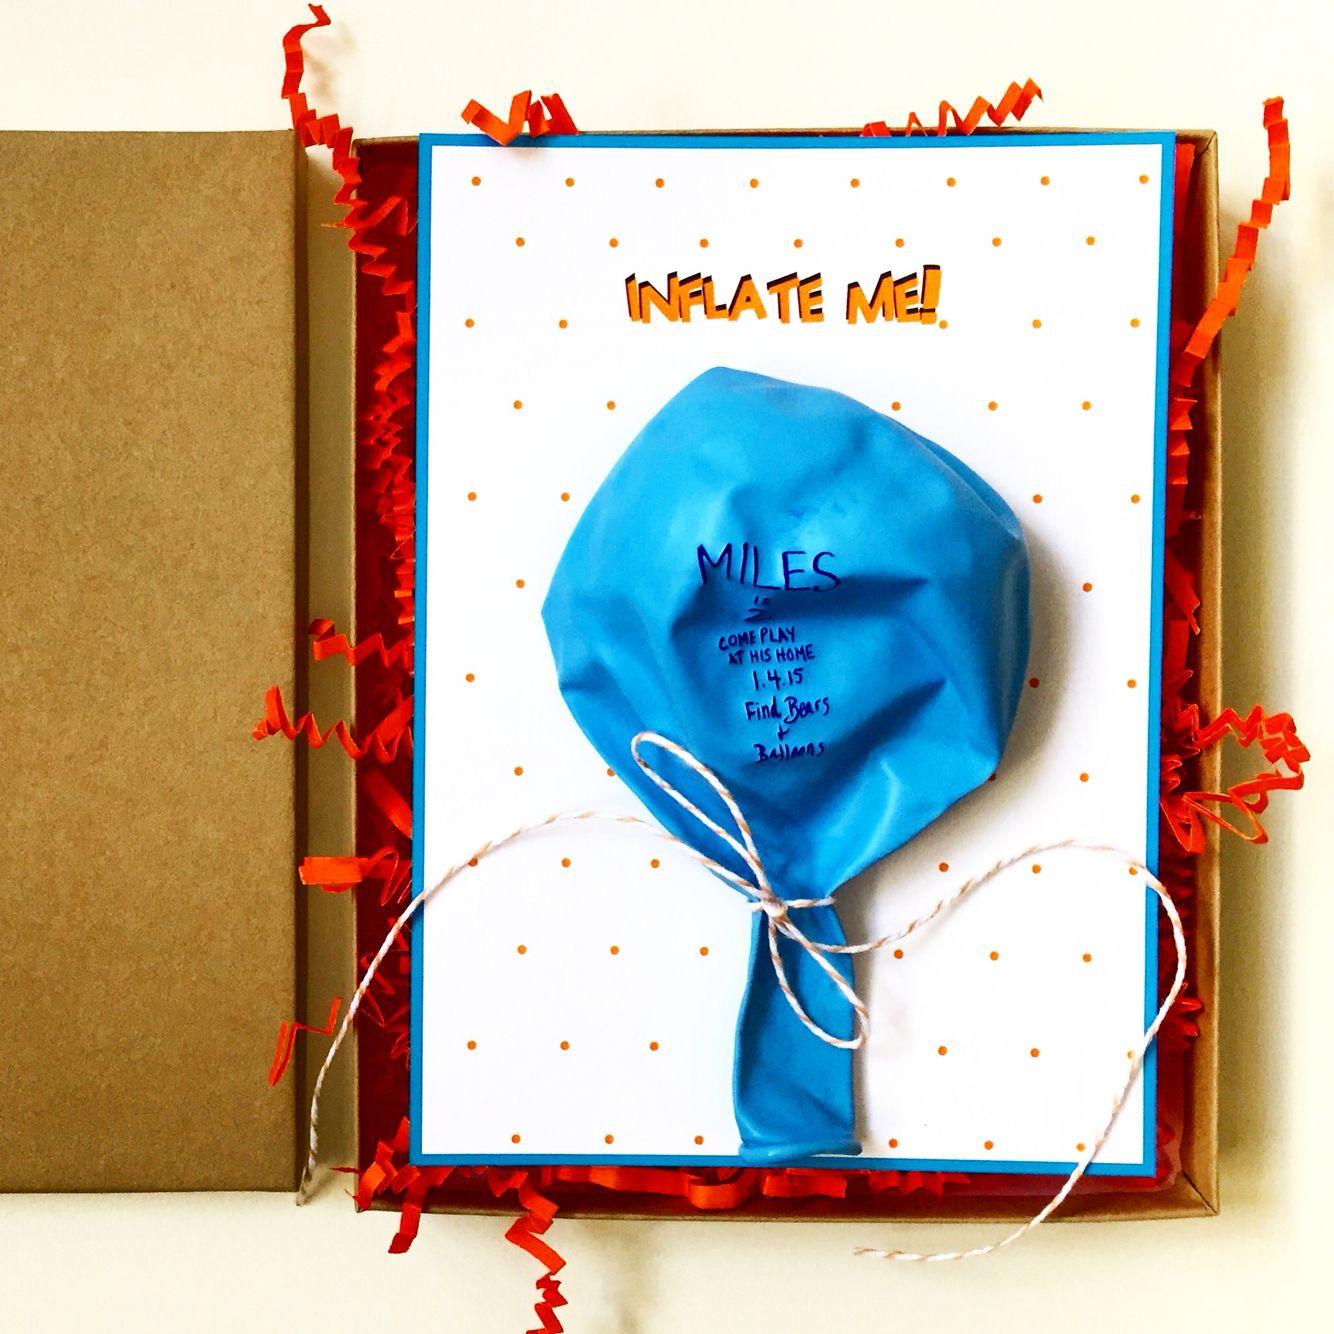 Birthday Invitation Box Inflate Me Balloon Party Marissa